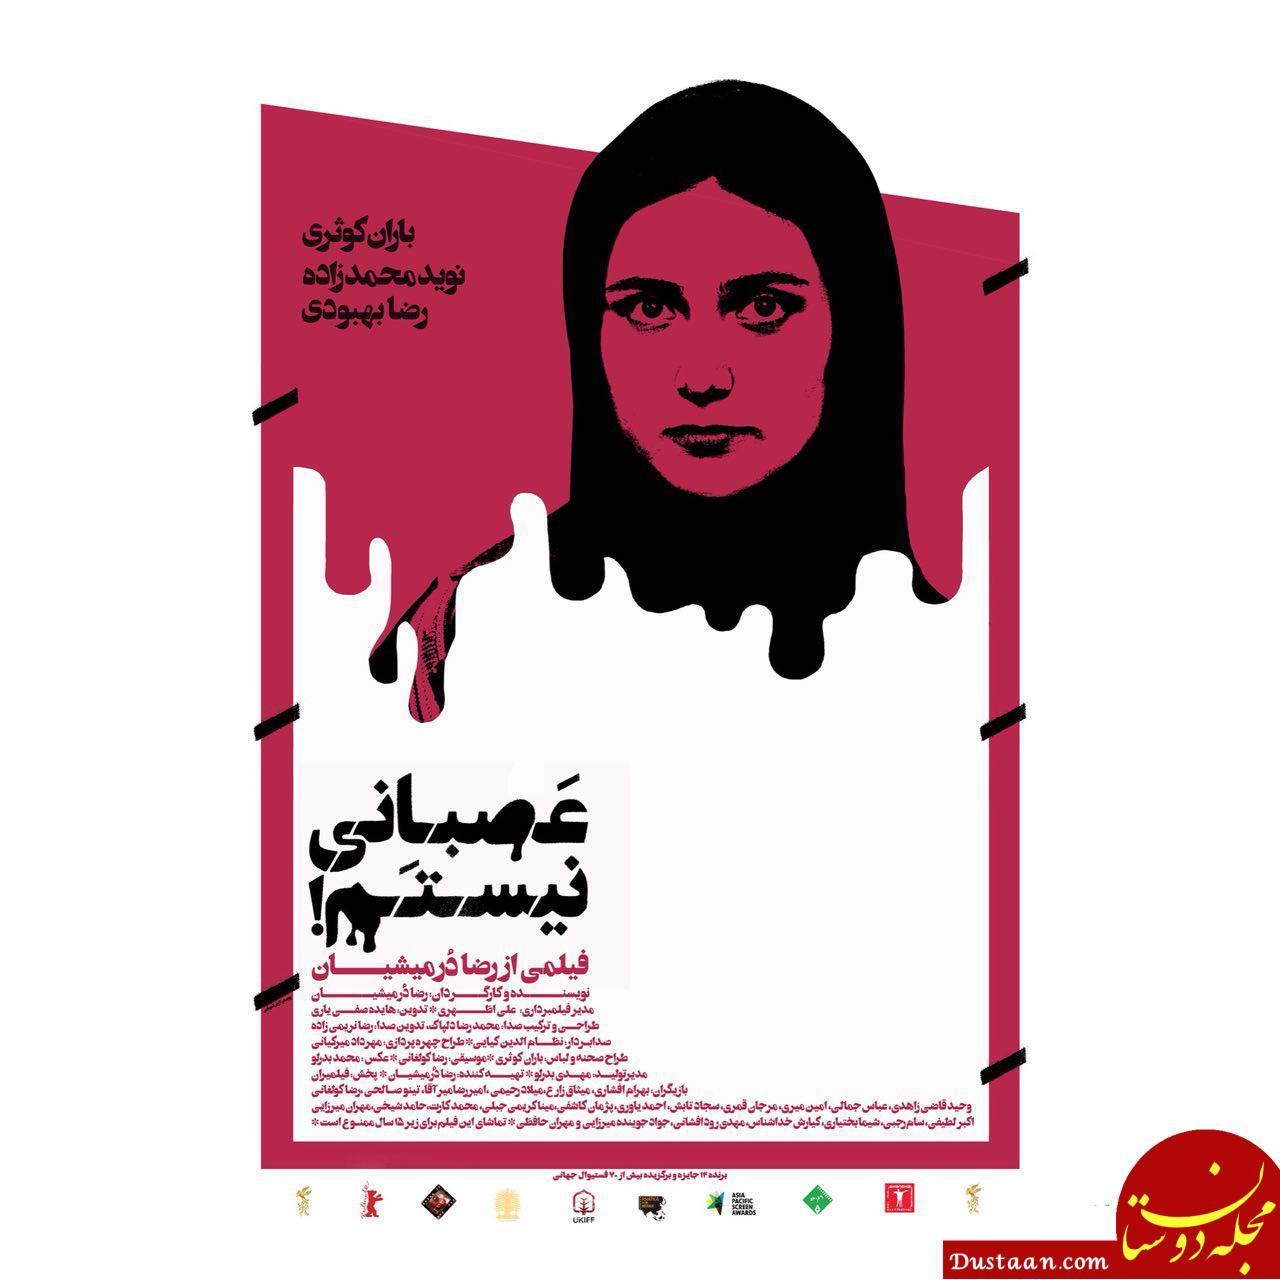 www.dustaan.com رونمایی از پوستر تازه «عصبانی نیستم!»